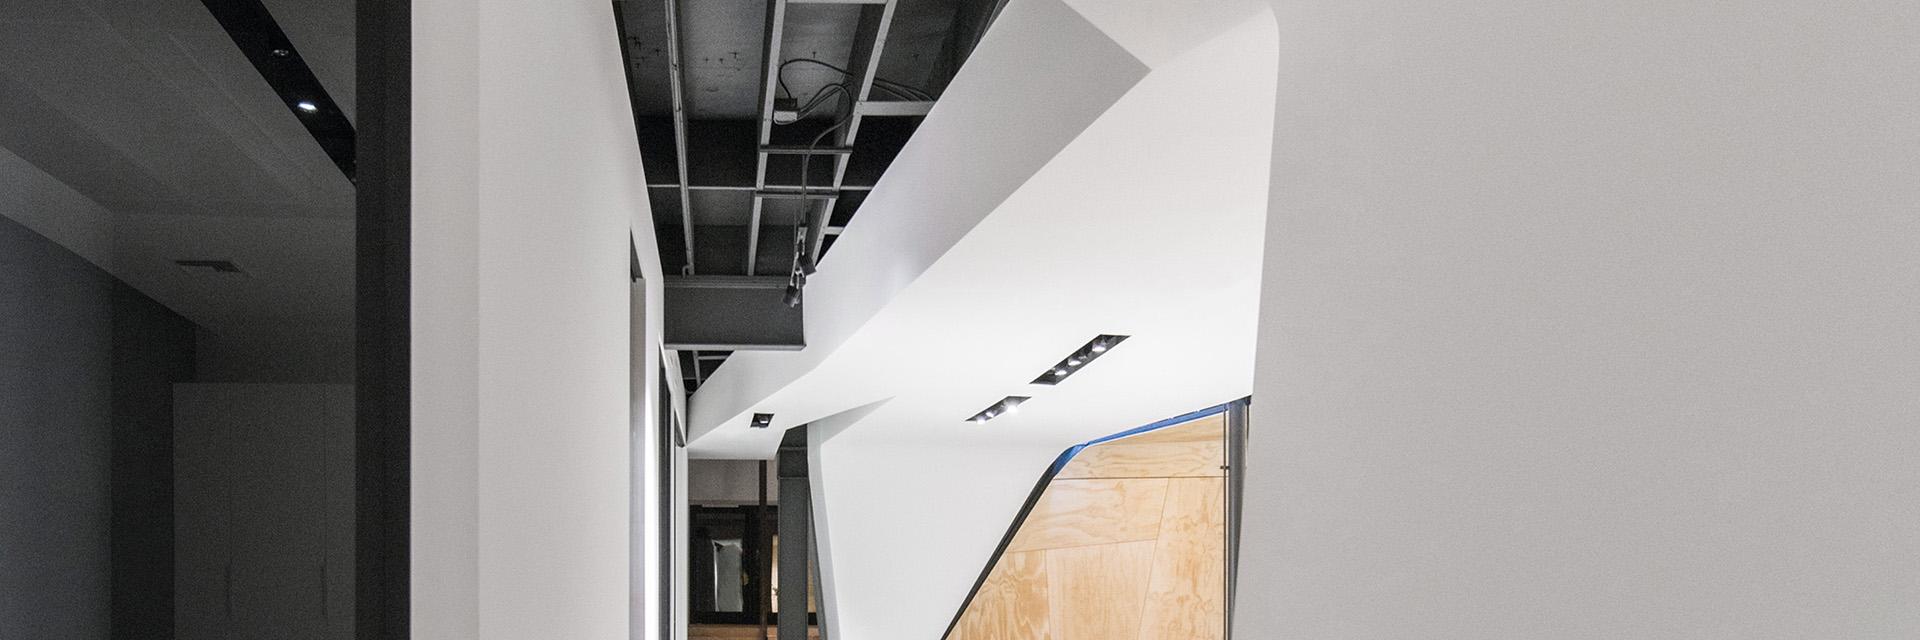 June Street Architecture - vil